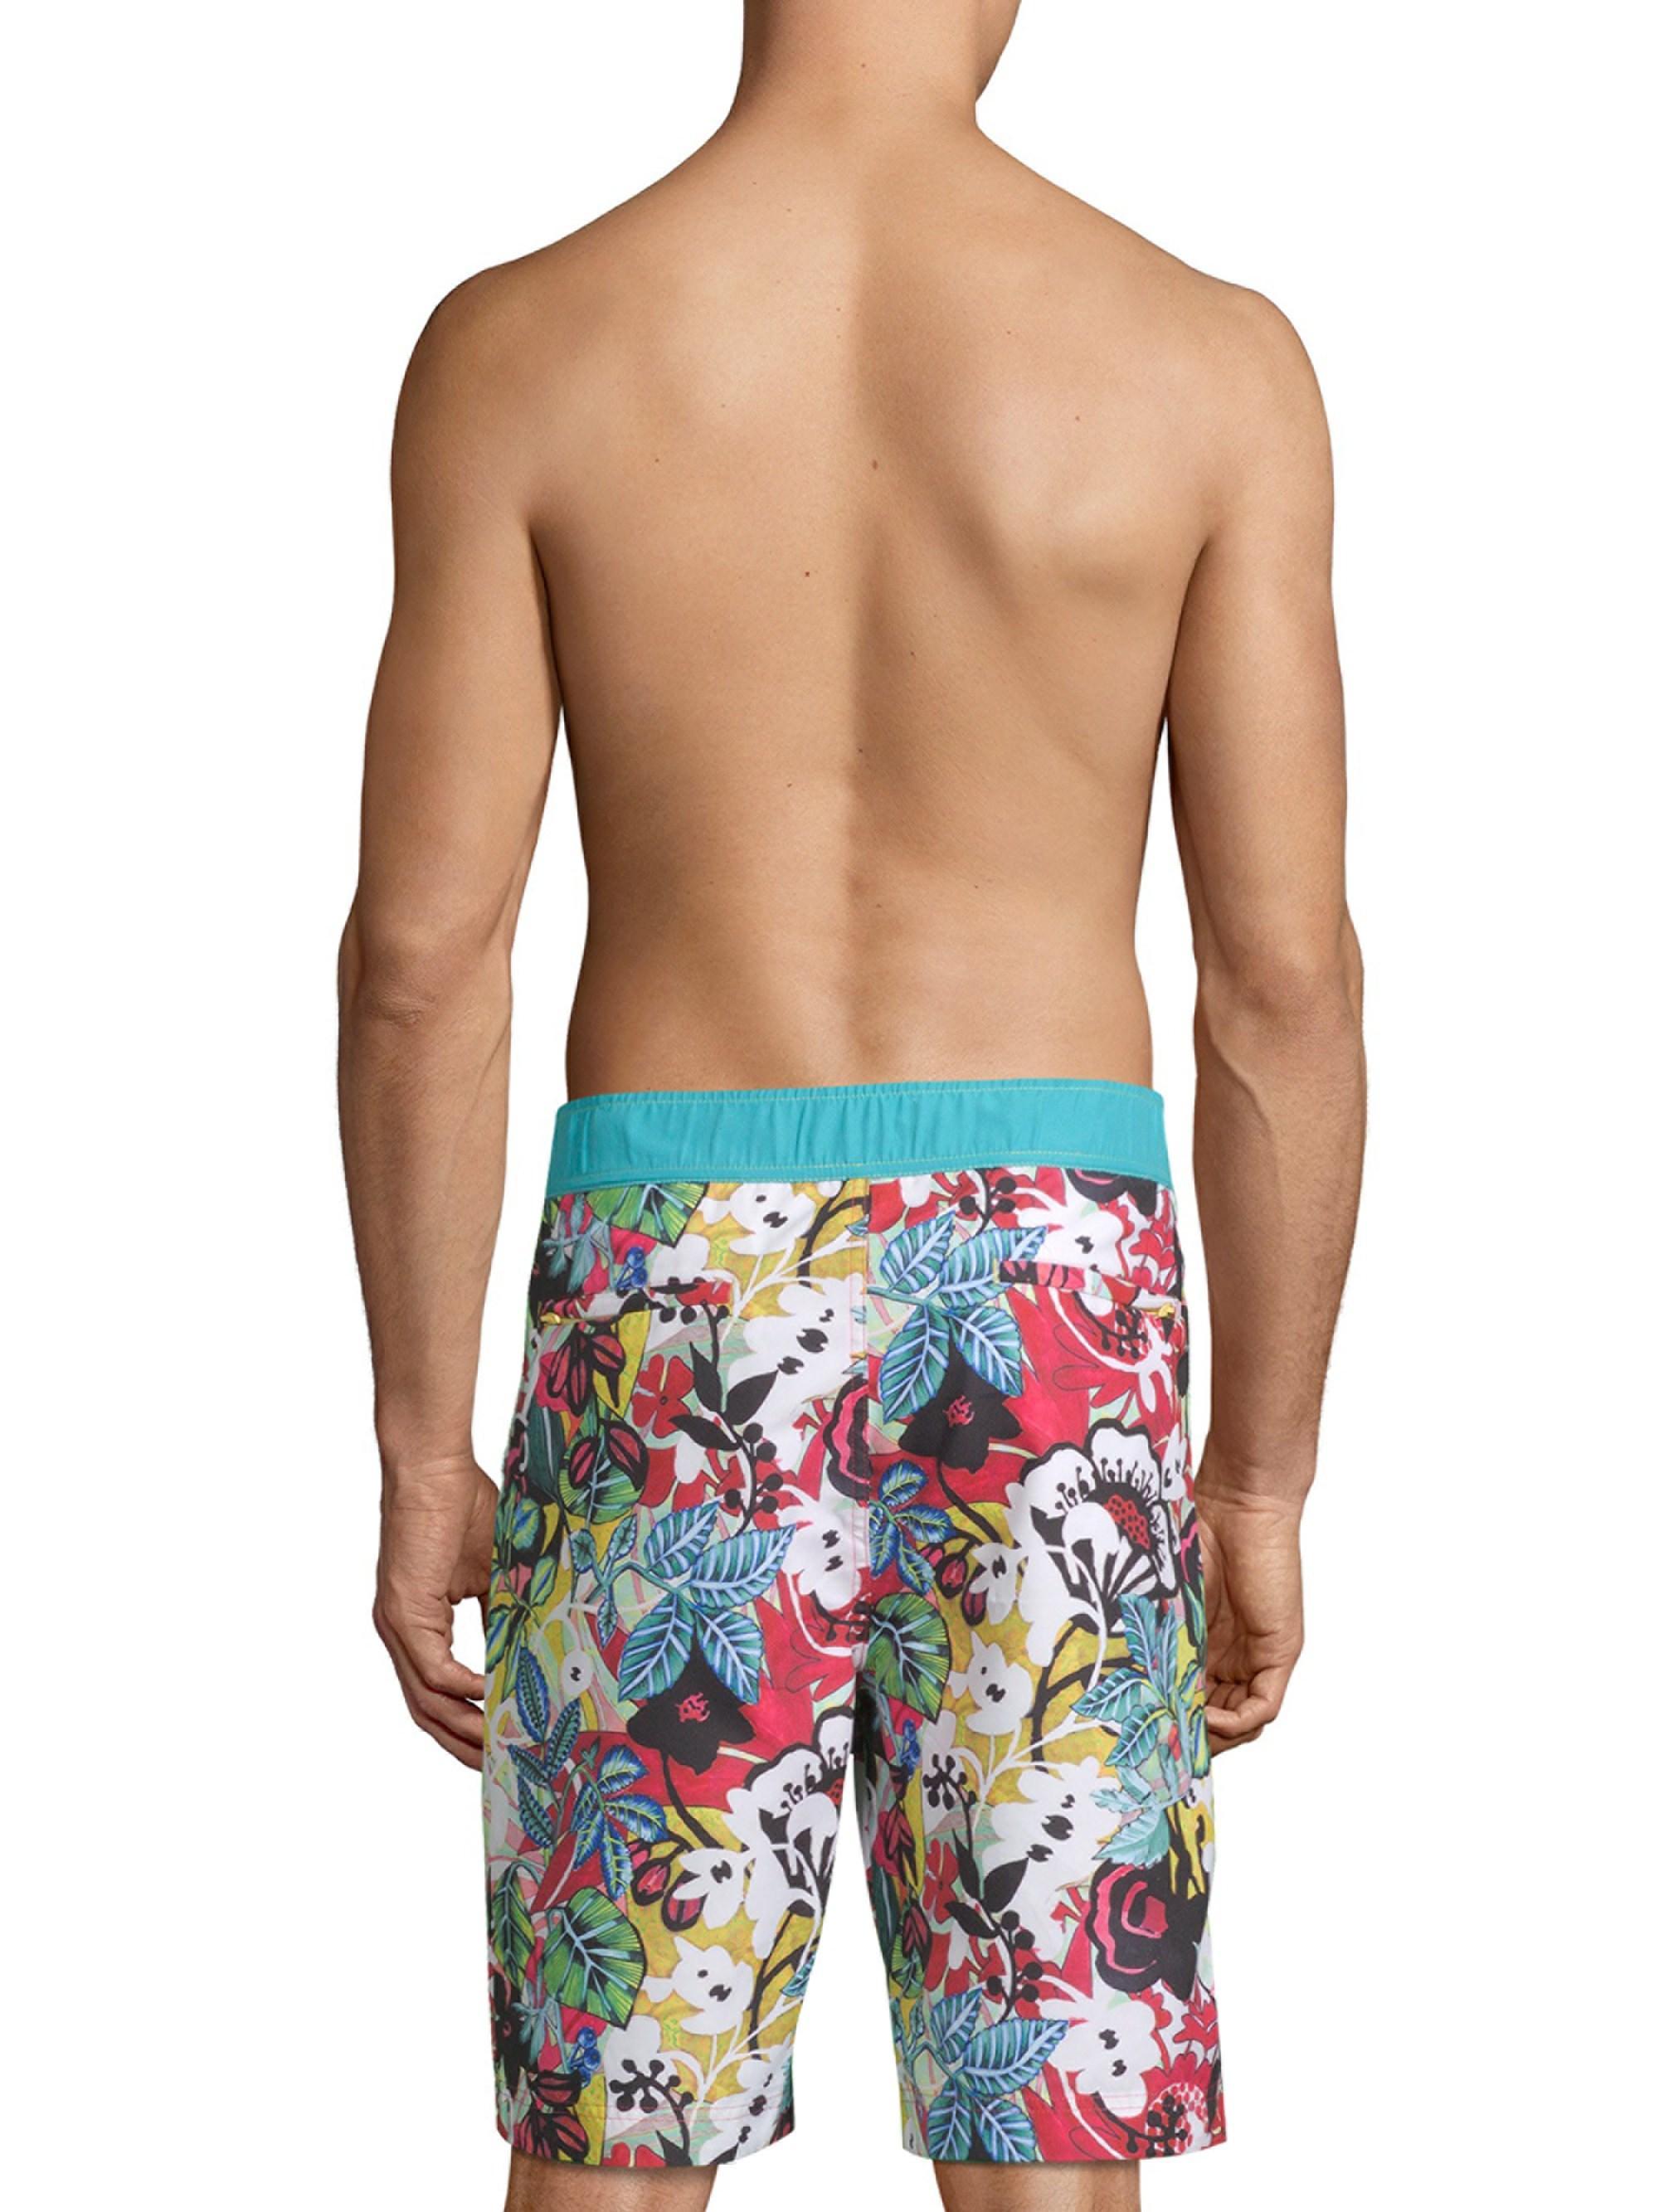 535d7535dc Lyst - Robert Graham Barbarito Tropical Board Shorts in Blue for Men